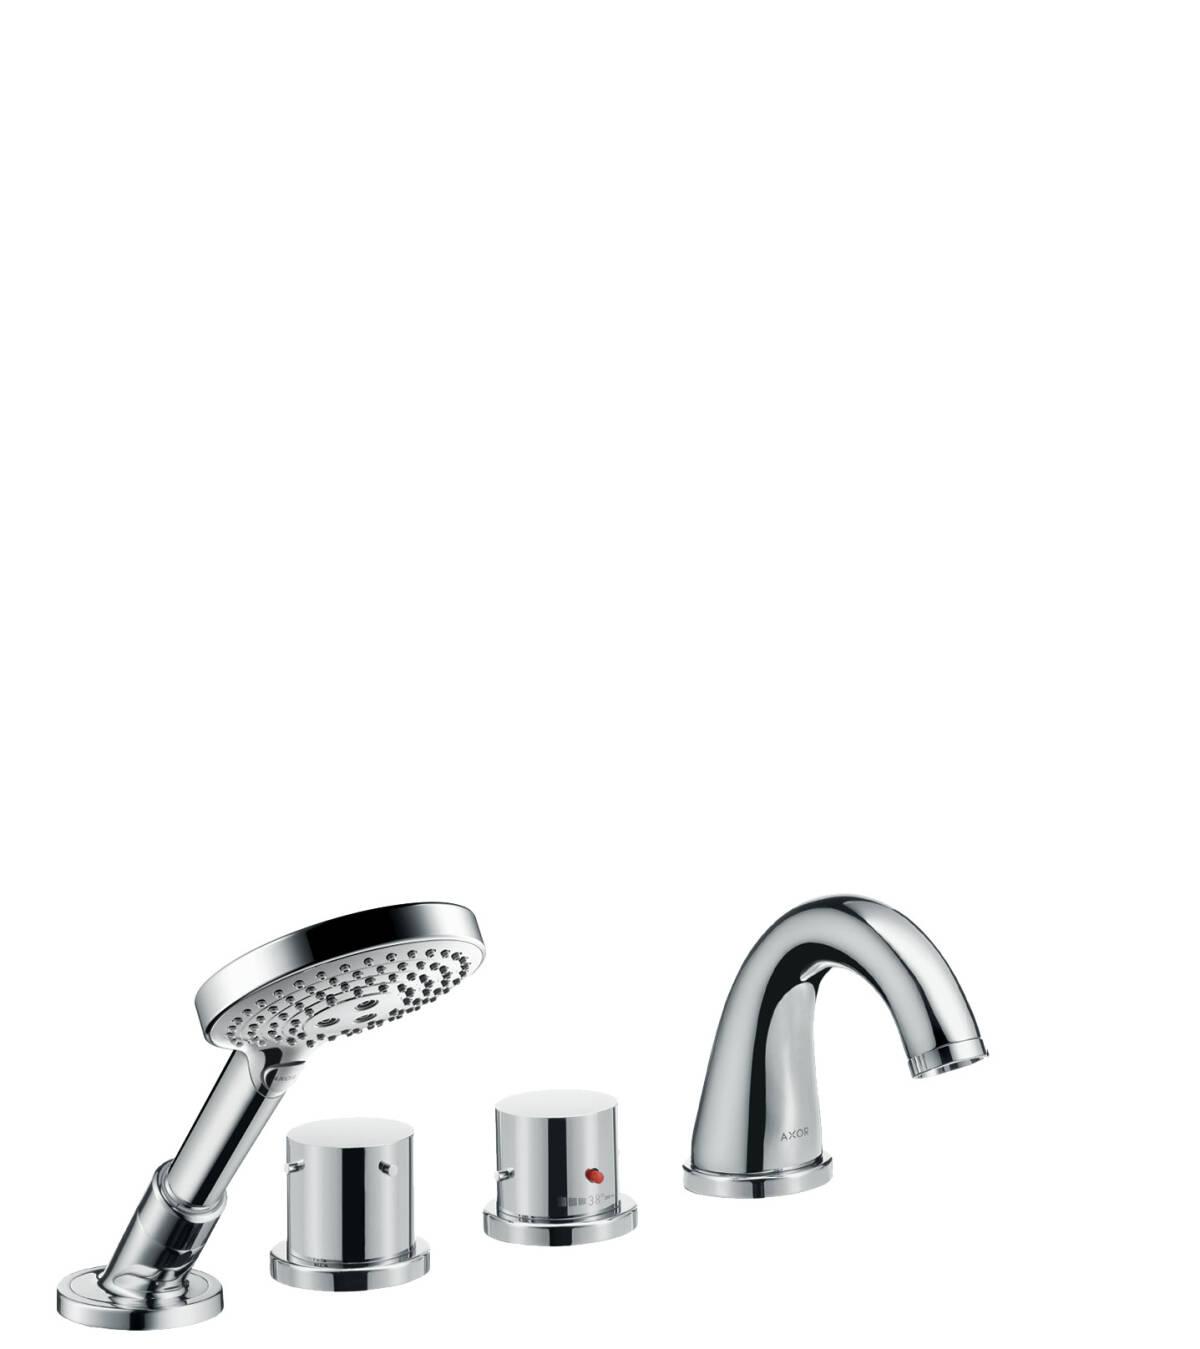 Grifería termostática de 4 agujeros para montaje sobre borde de bañera, bronce cepillado, 10461140